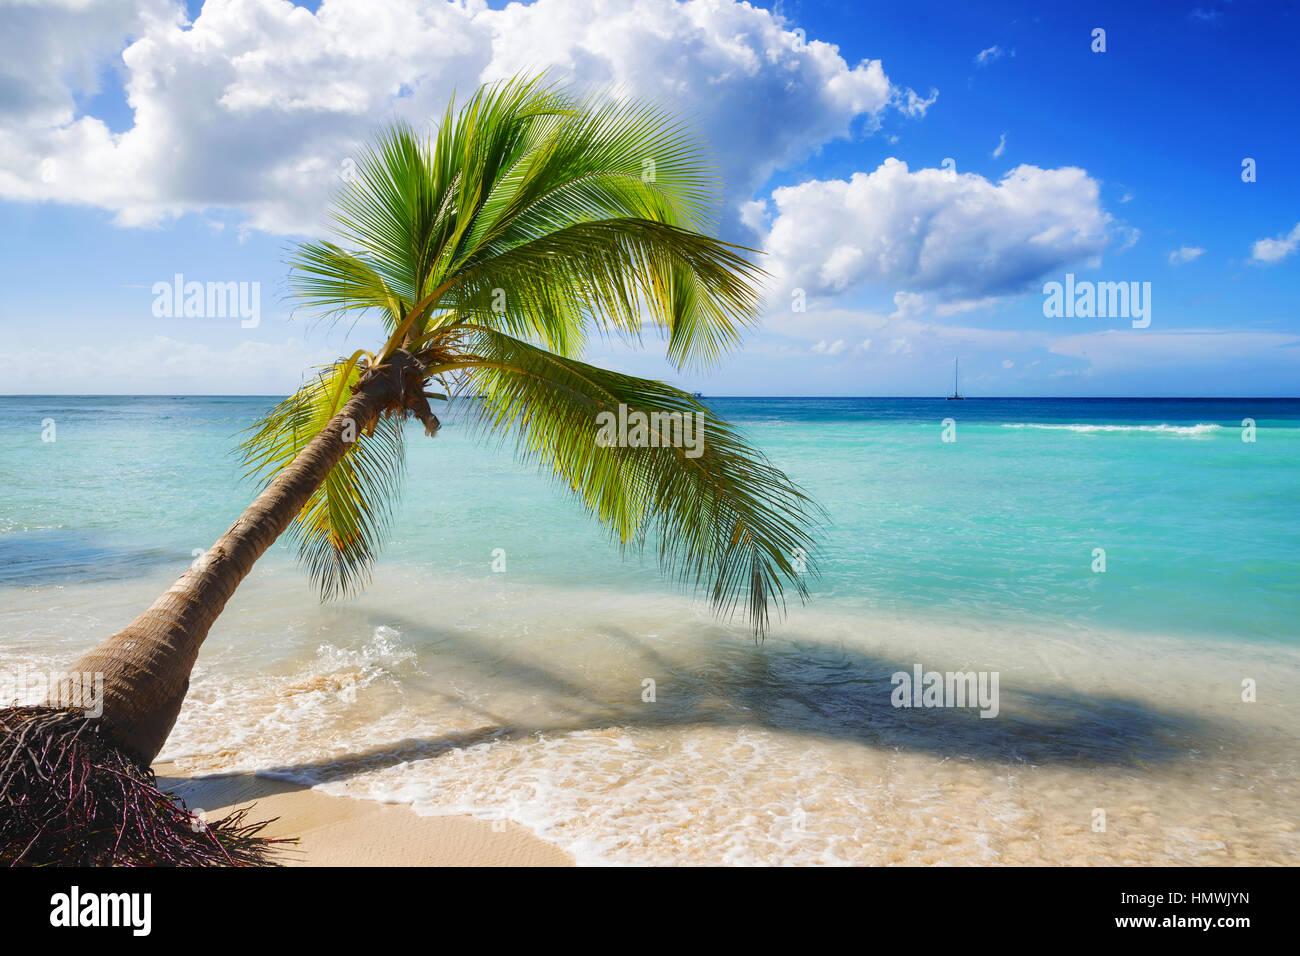 caribbean beach landscape - Stock Image